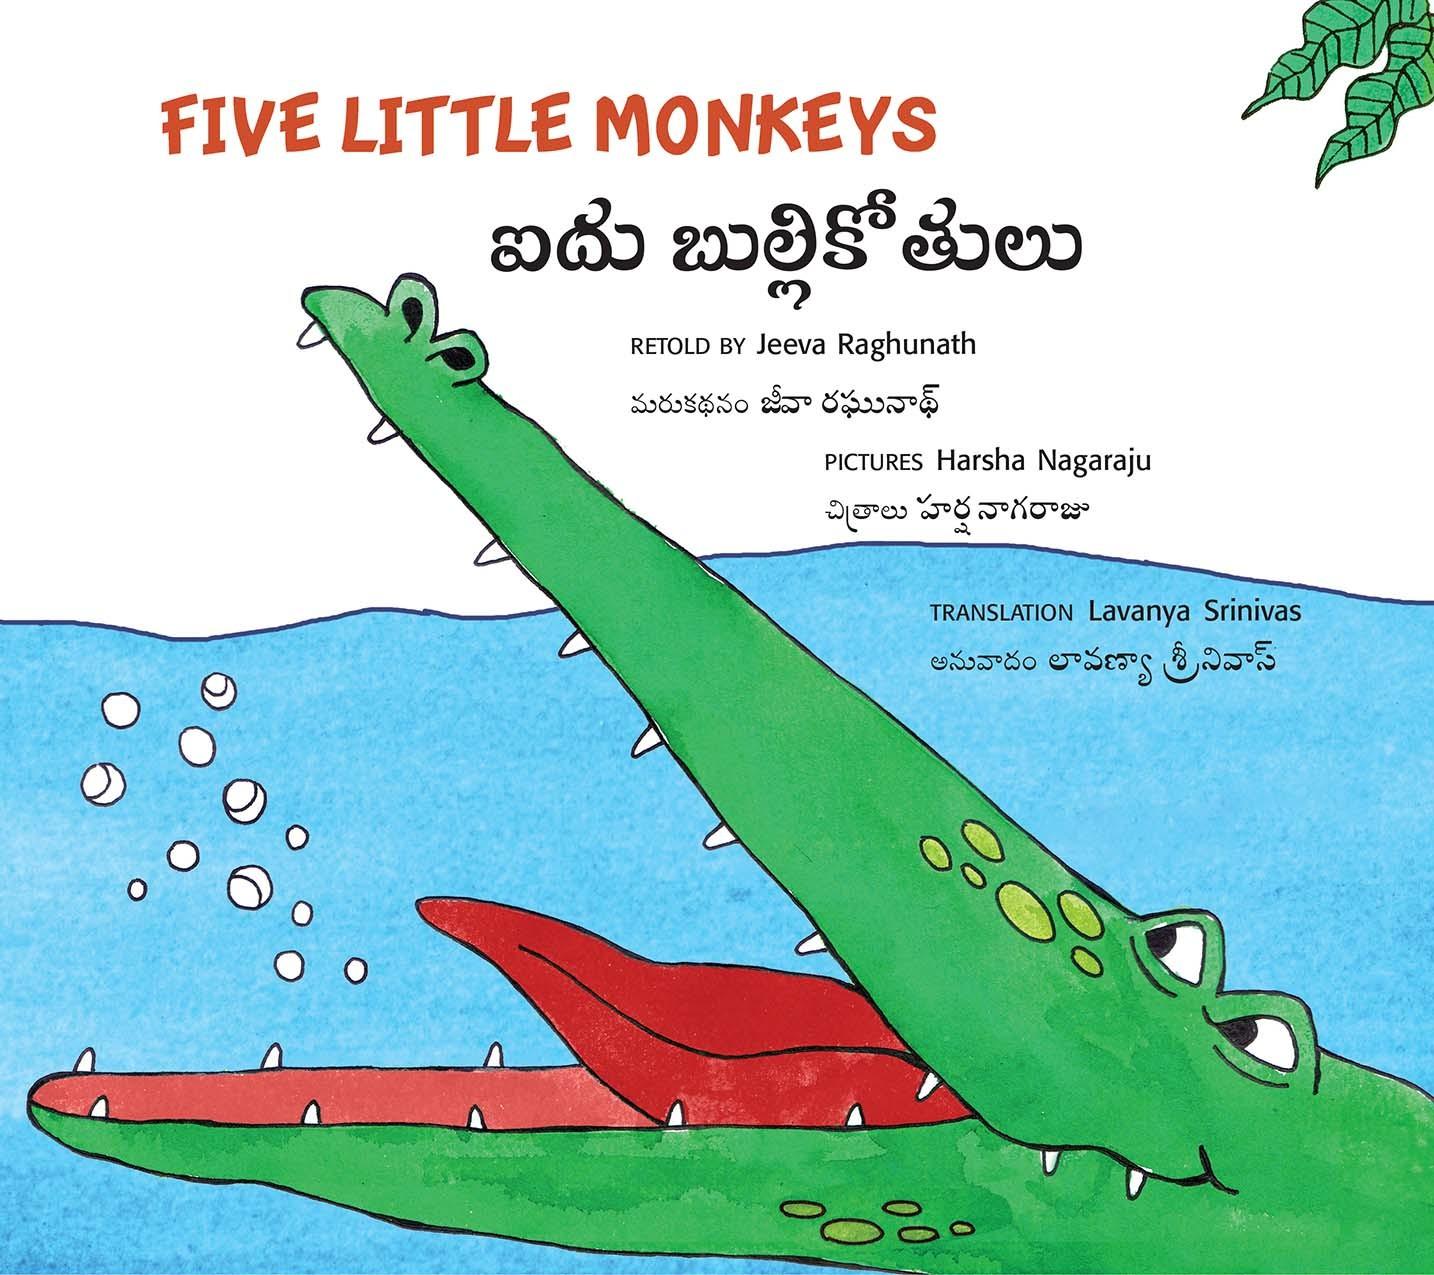 Five Little Monkeys/Aidu Bulli Kothulu (English-Telugu)